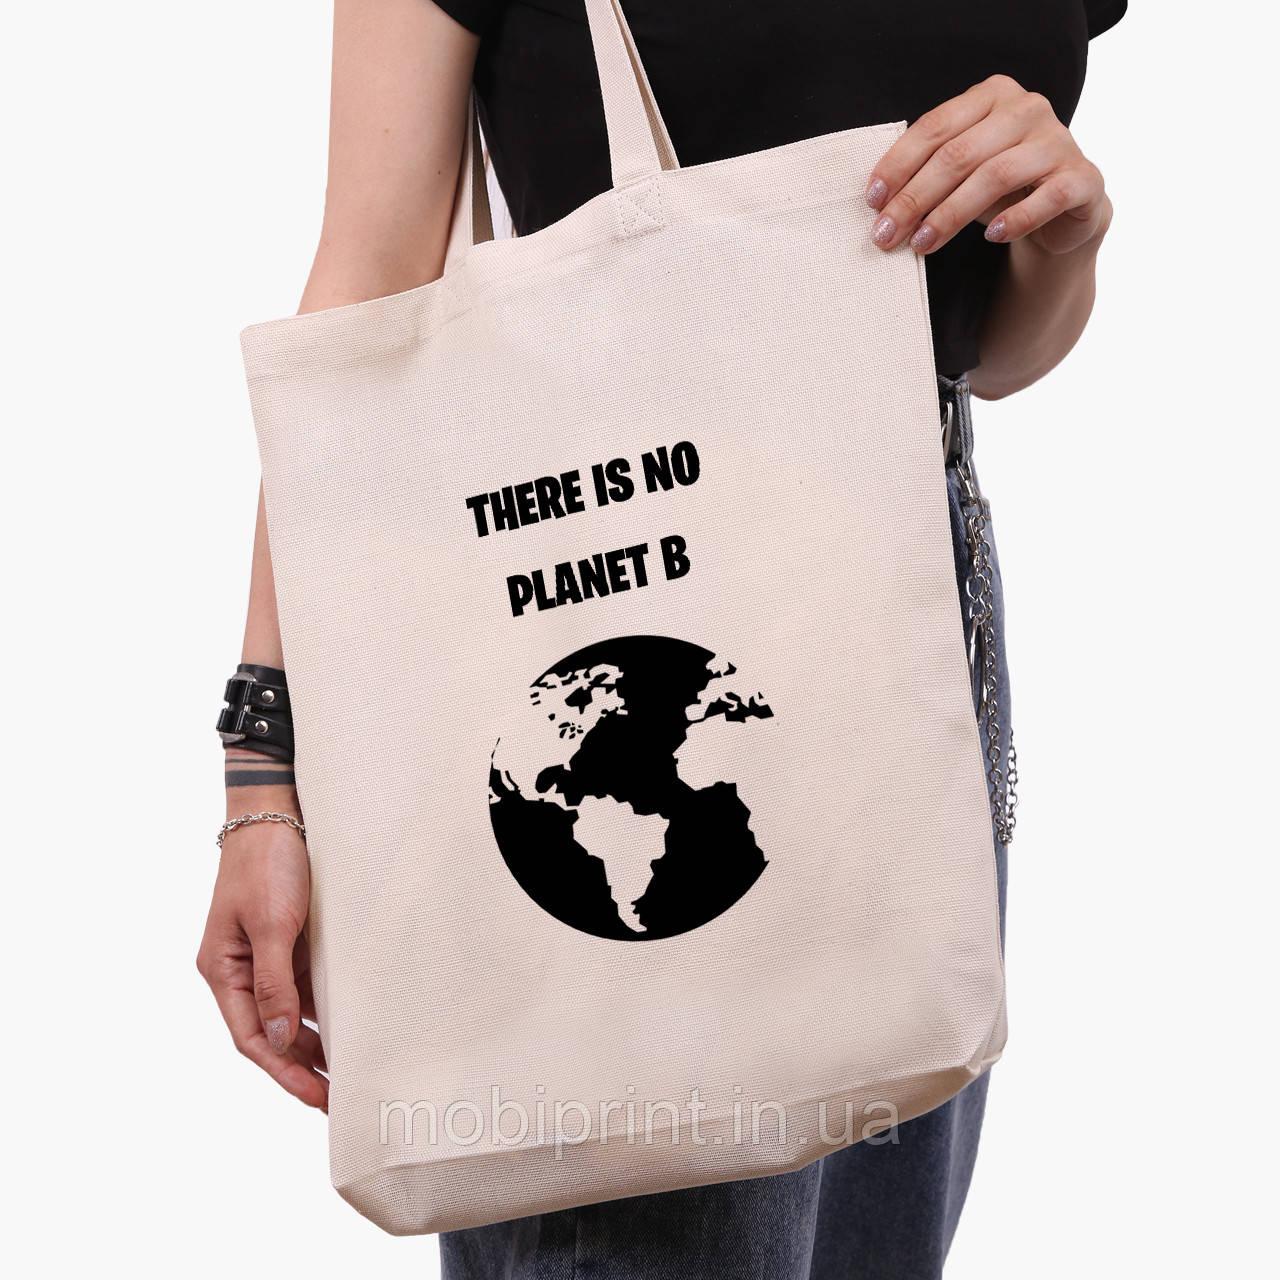 Эко сумка шоппер белая Экология (Ecology) (9227-1333-1)  экосумка шопер 41*39*8 см